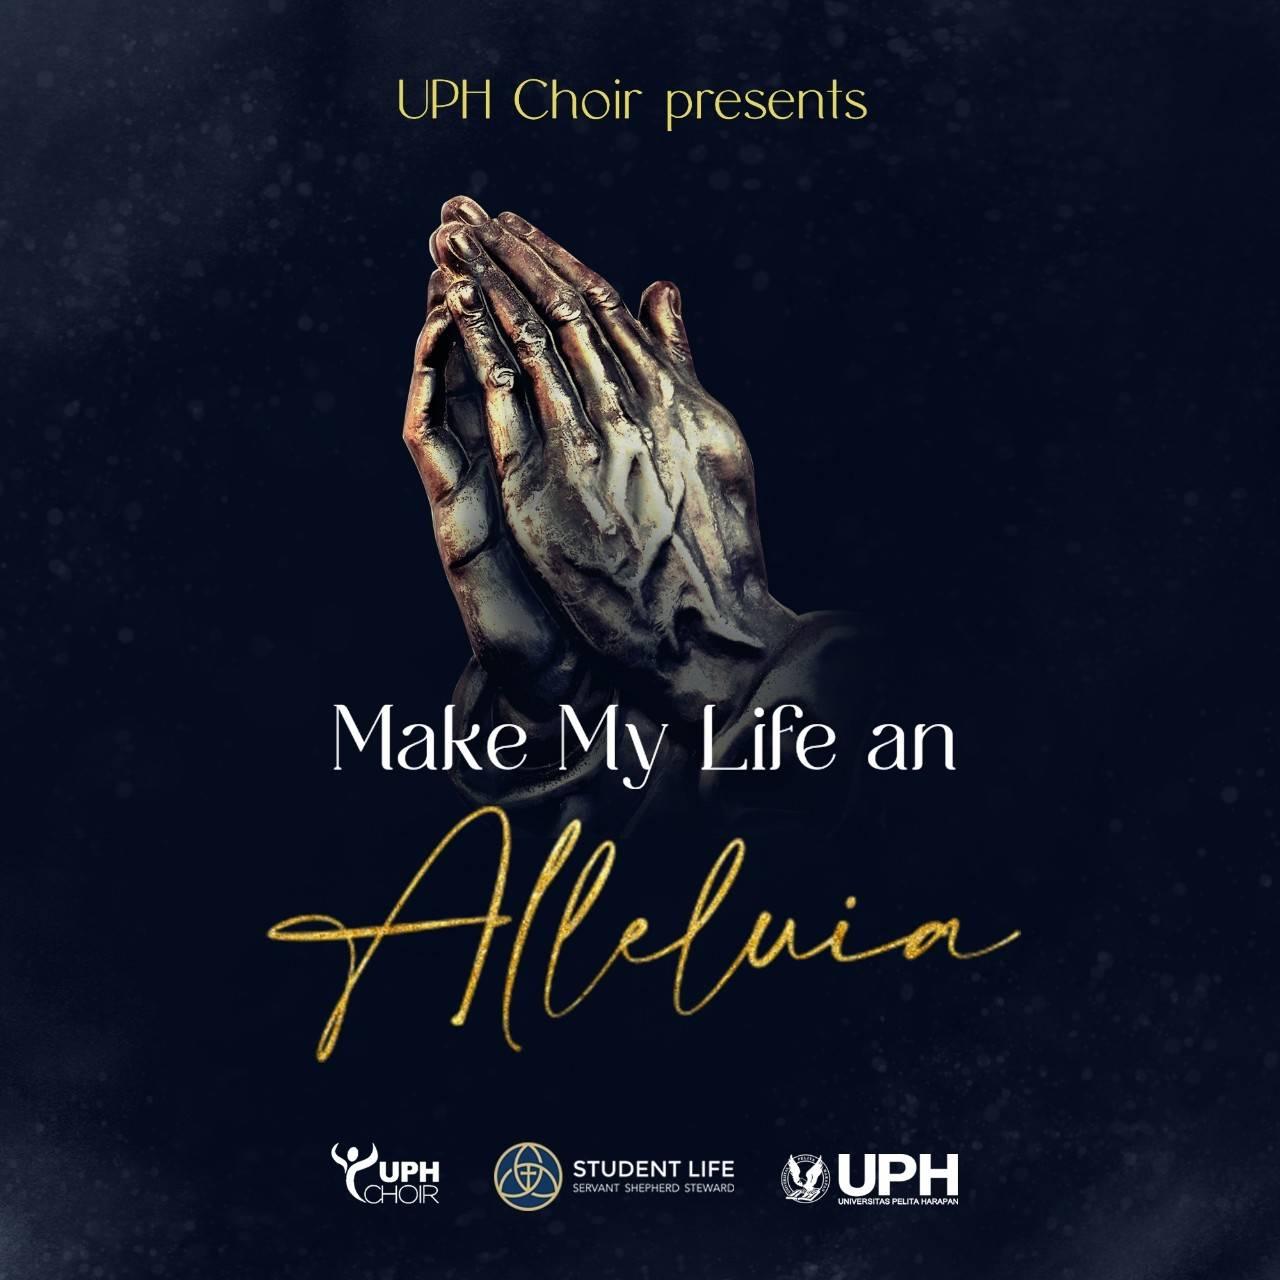 Make My Life an Alleluia